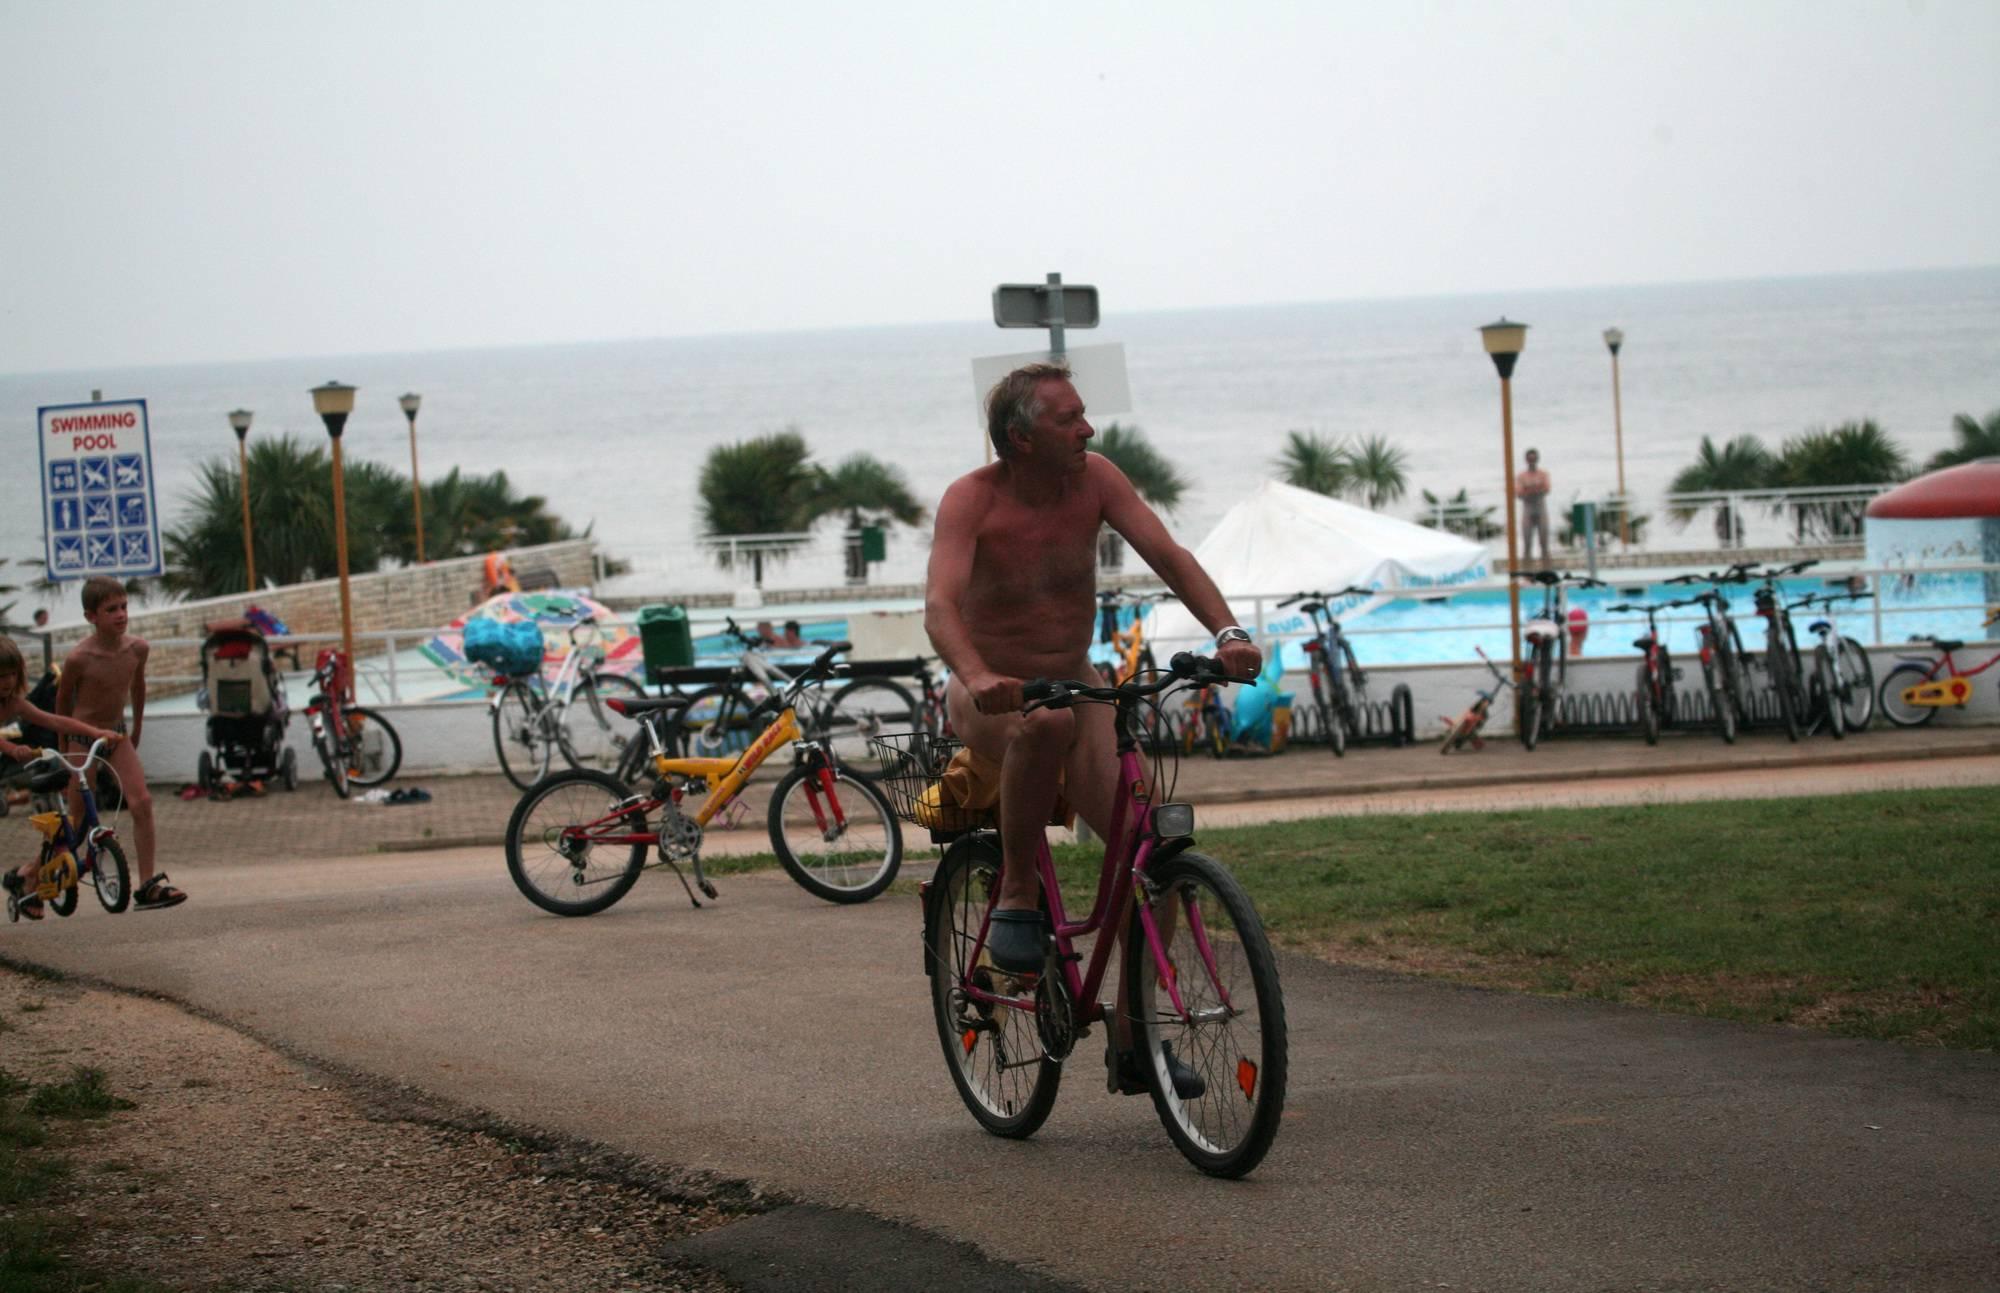 Naturist Poolside Biking - 1